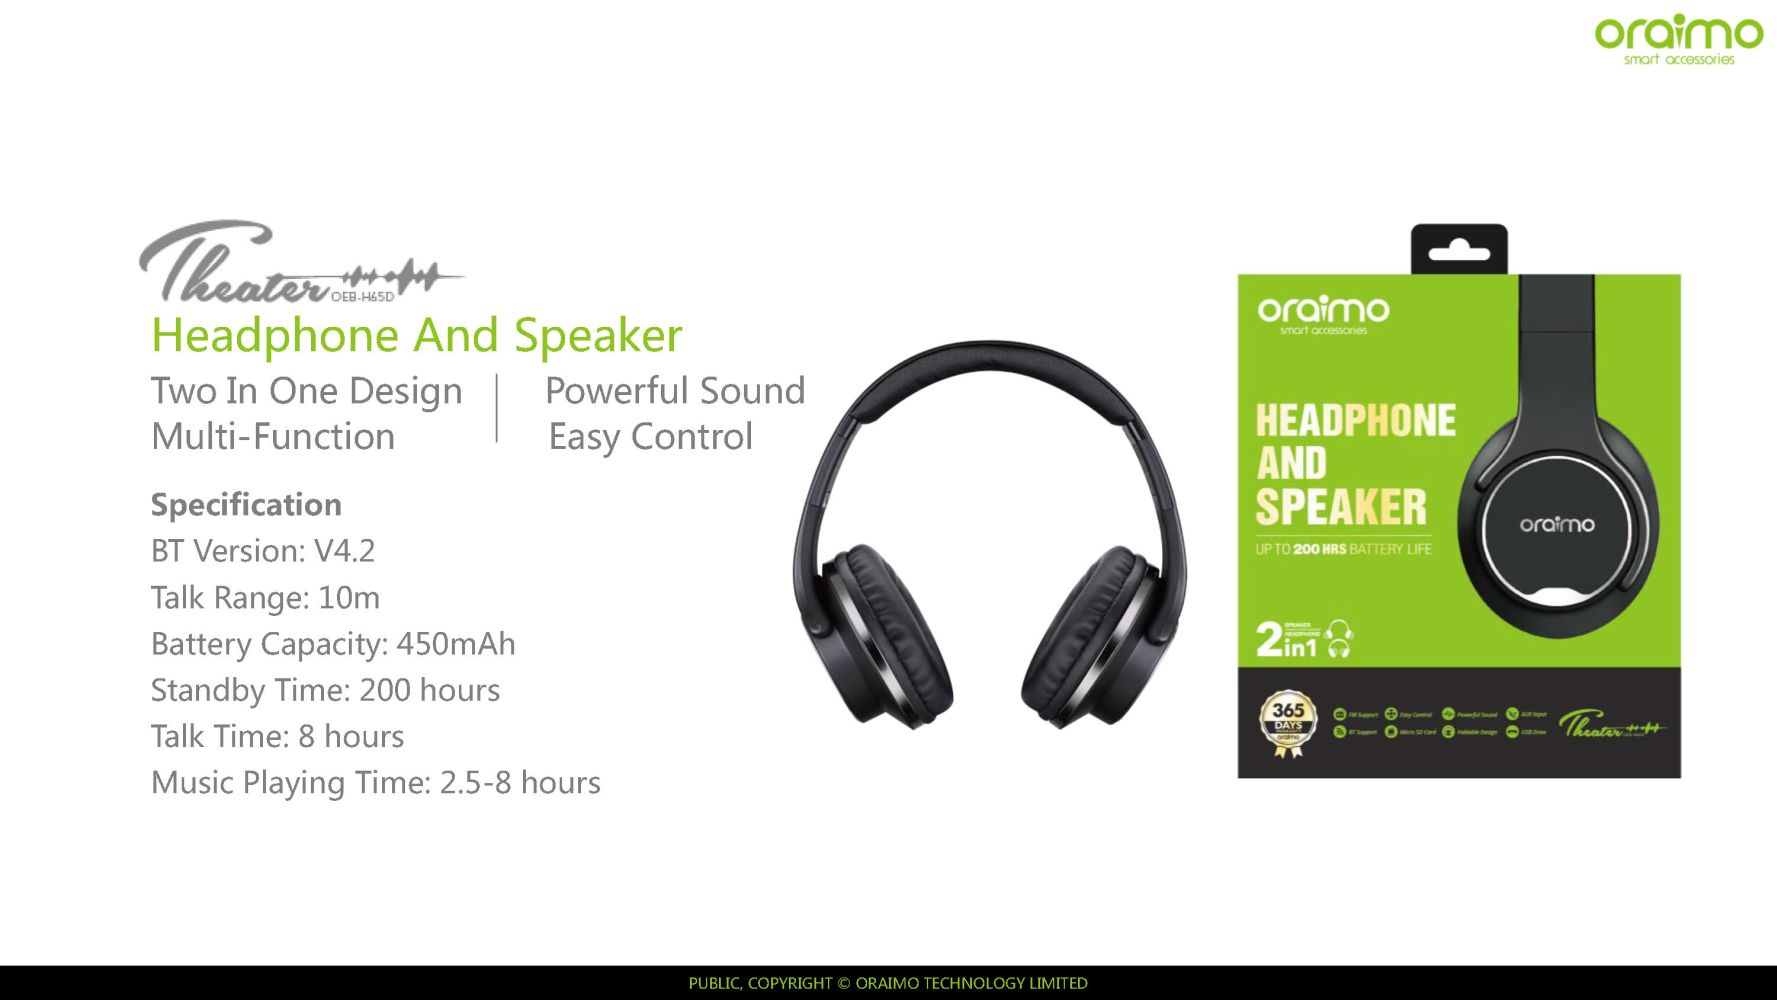 f8a59f6e067 You're viewing: oraimo – Theater – Wireless headphone & Speaker 2 in 1 £  100.00